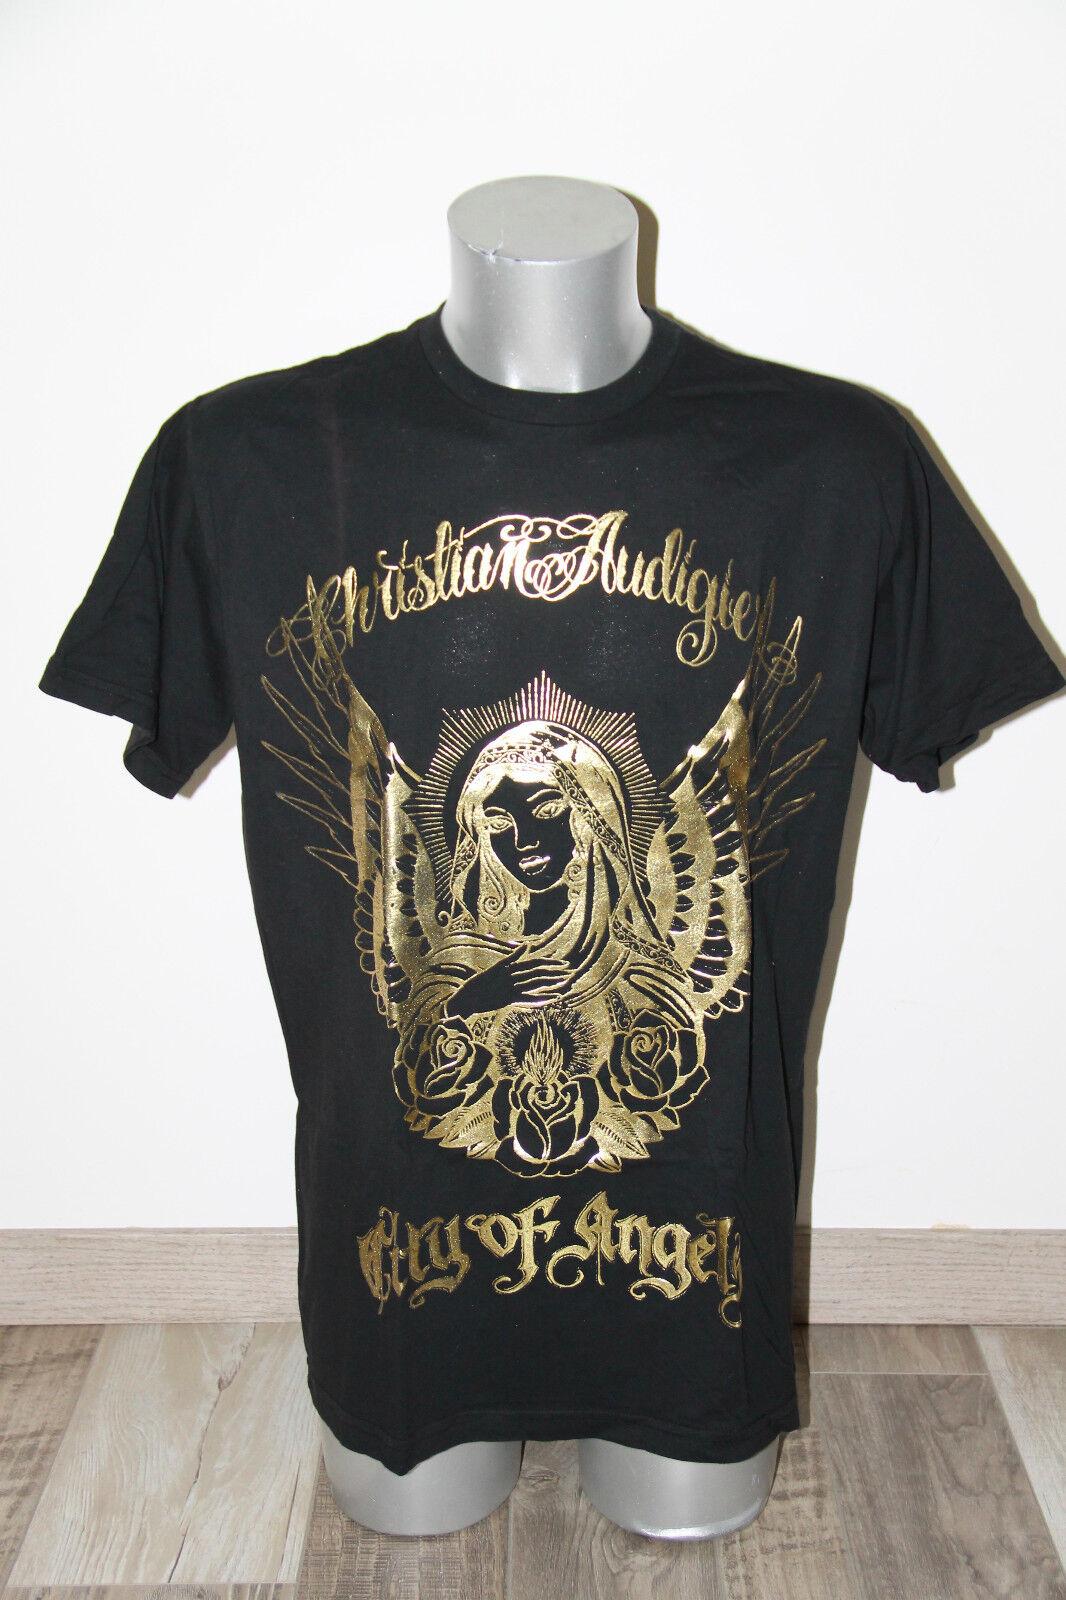 Camiseta negra/dorado ED HARDY audigier la ciudad de ÁNGELES TALLA XXL ETIQUETA